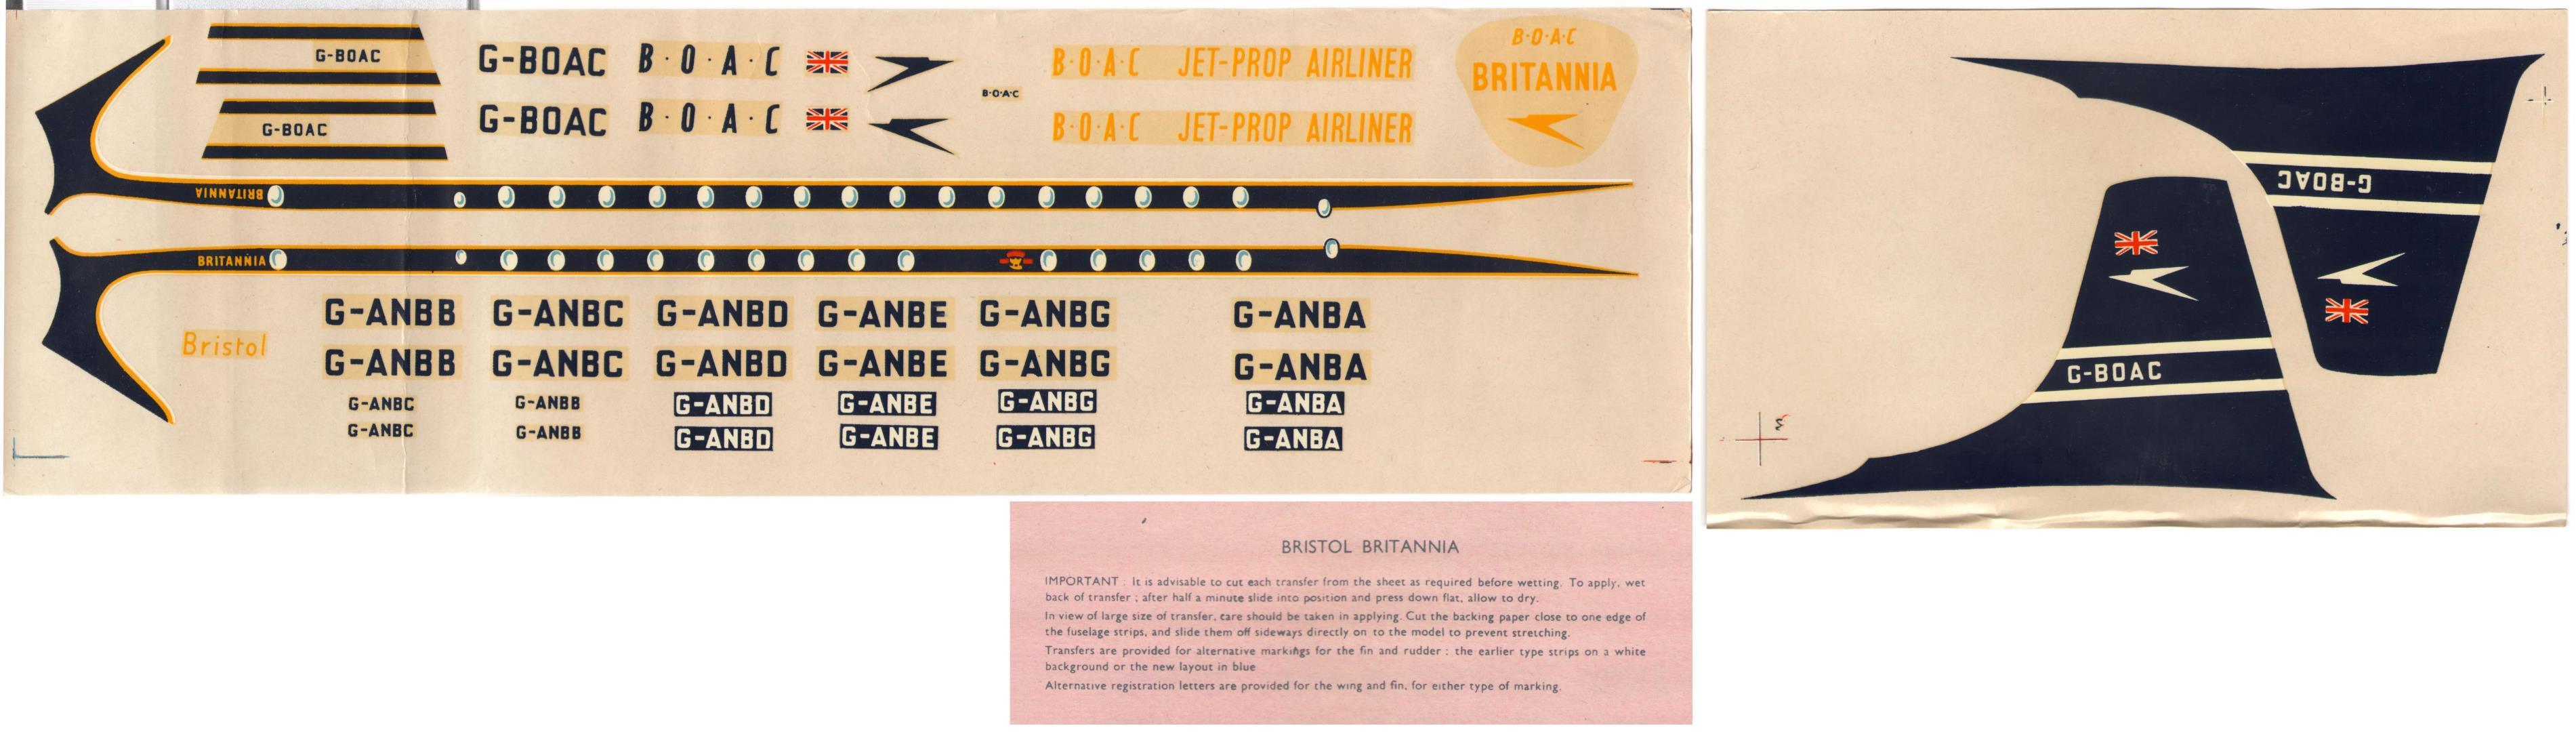 Декаль FROG 350P The B∙O∙A∙C Bristol Britannia Jet-Prop Airliner